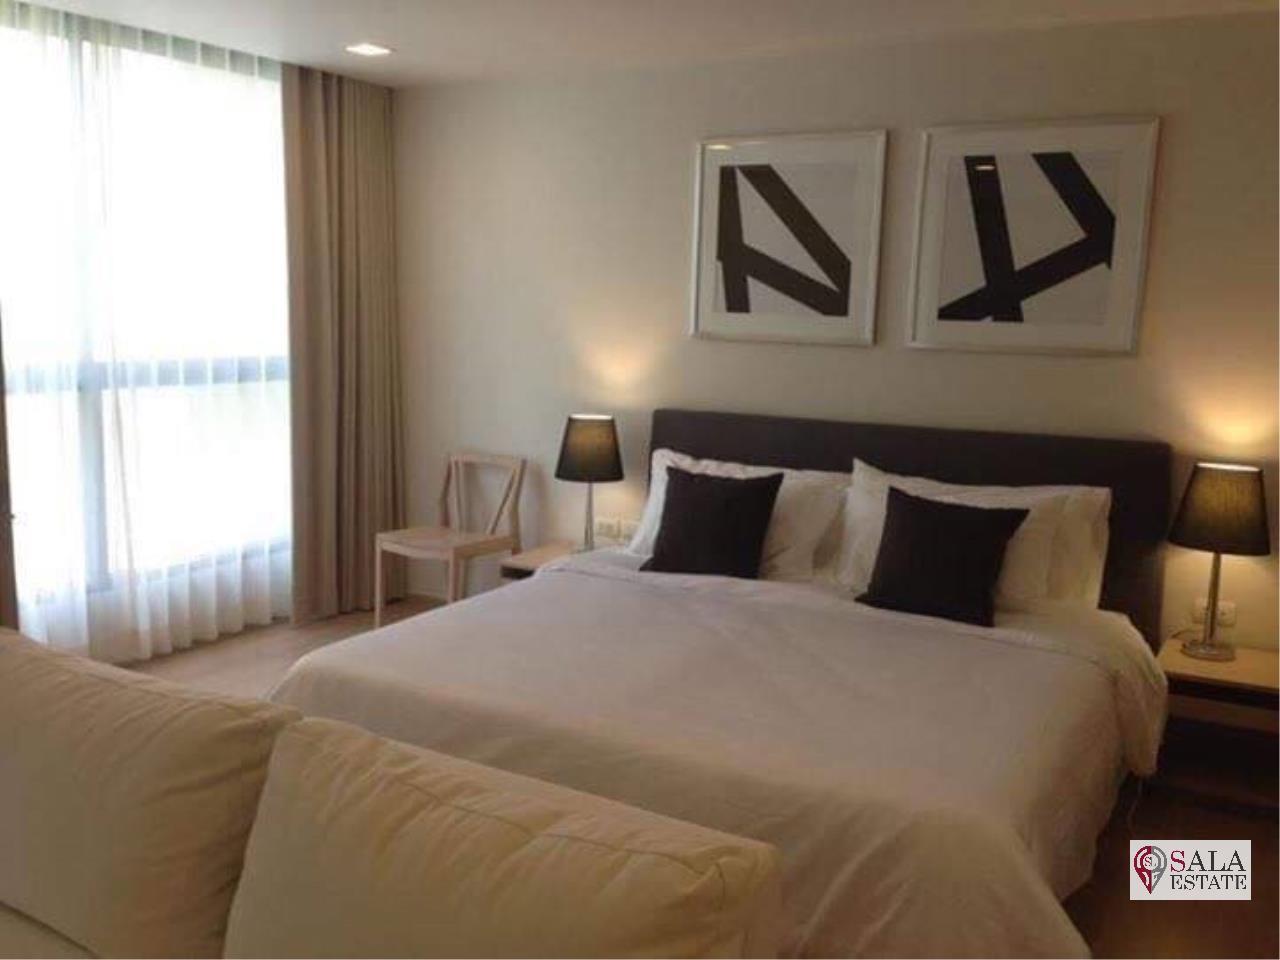 SALA ESTATE Agency's (FOR RENT) LIV@49 – BTS PHROM PHONG, 1 BEDROOM 1 BATHROOM, FULLY FURNISHED, CITY VIEW 3